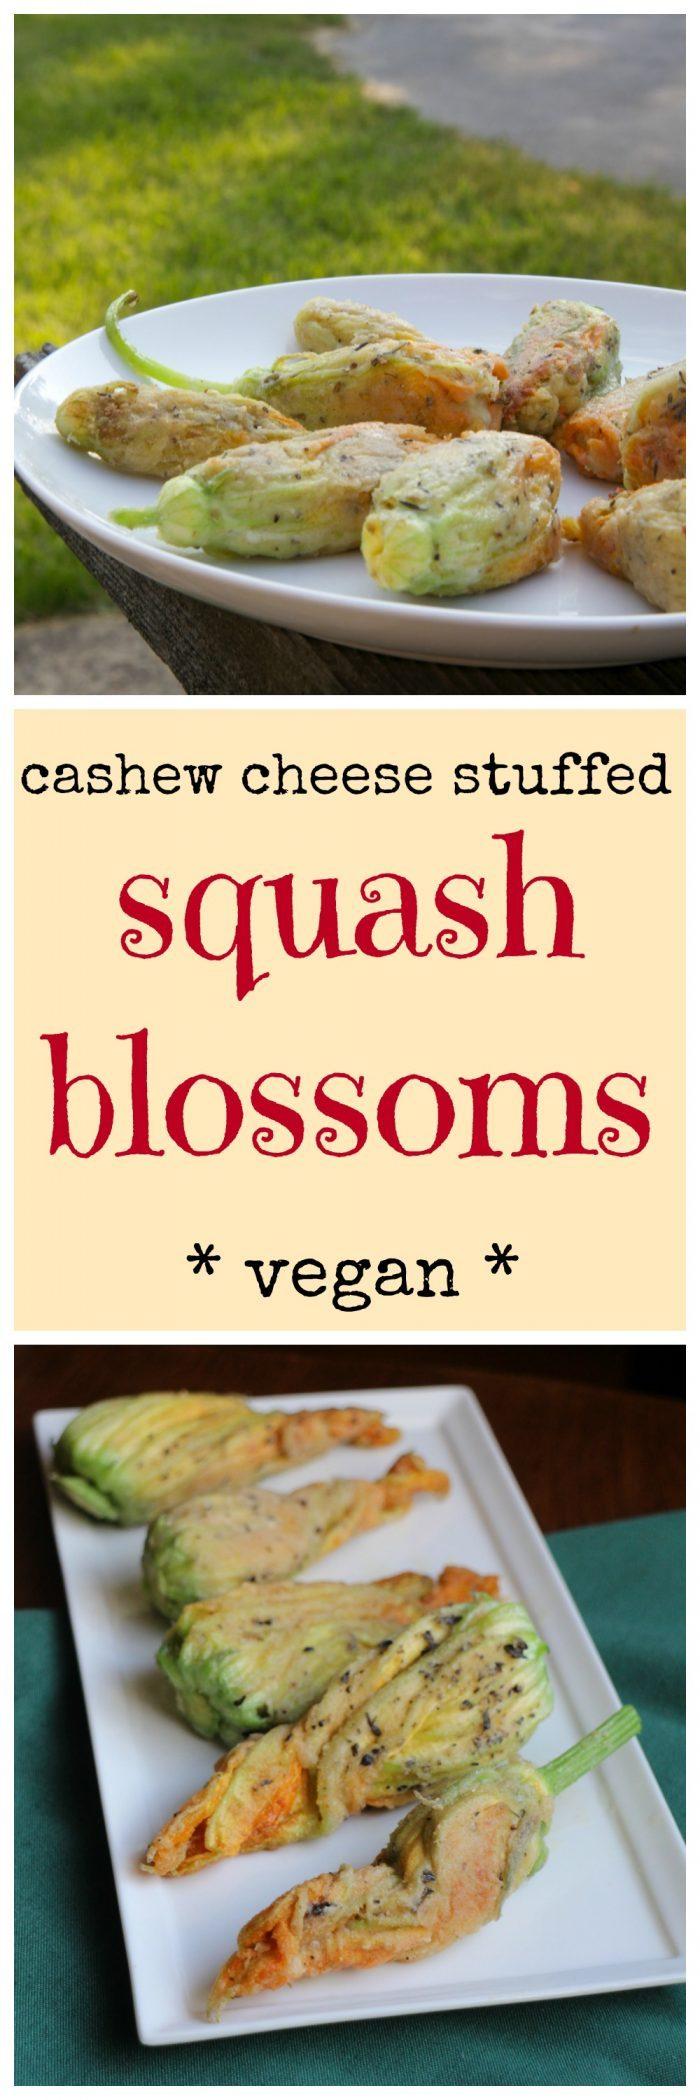 Fried cashew cheese stuffed squash blossoms. A decadent, vegan appetizer. Sure to impress!   cadryskitchen.com